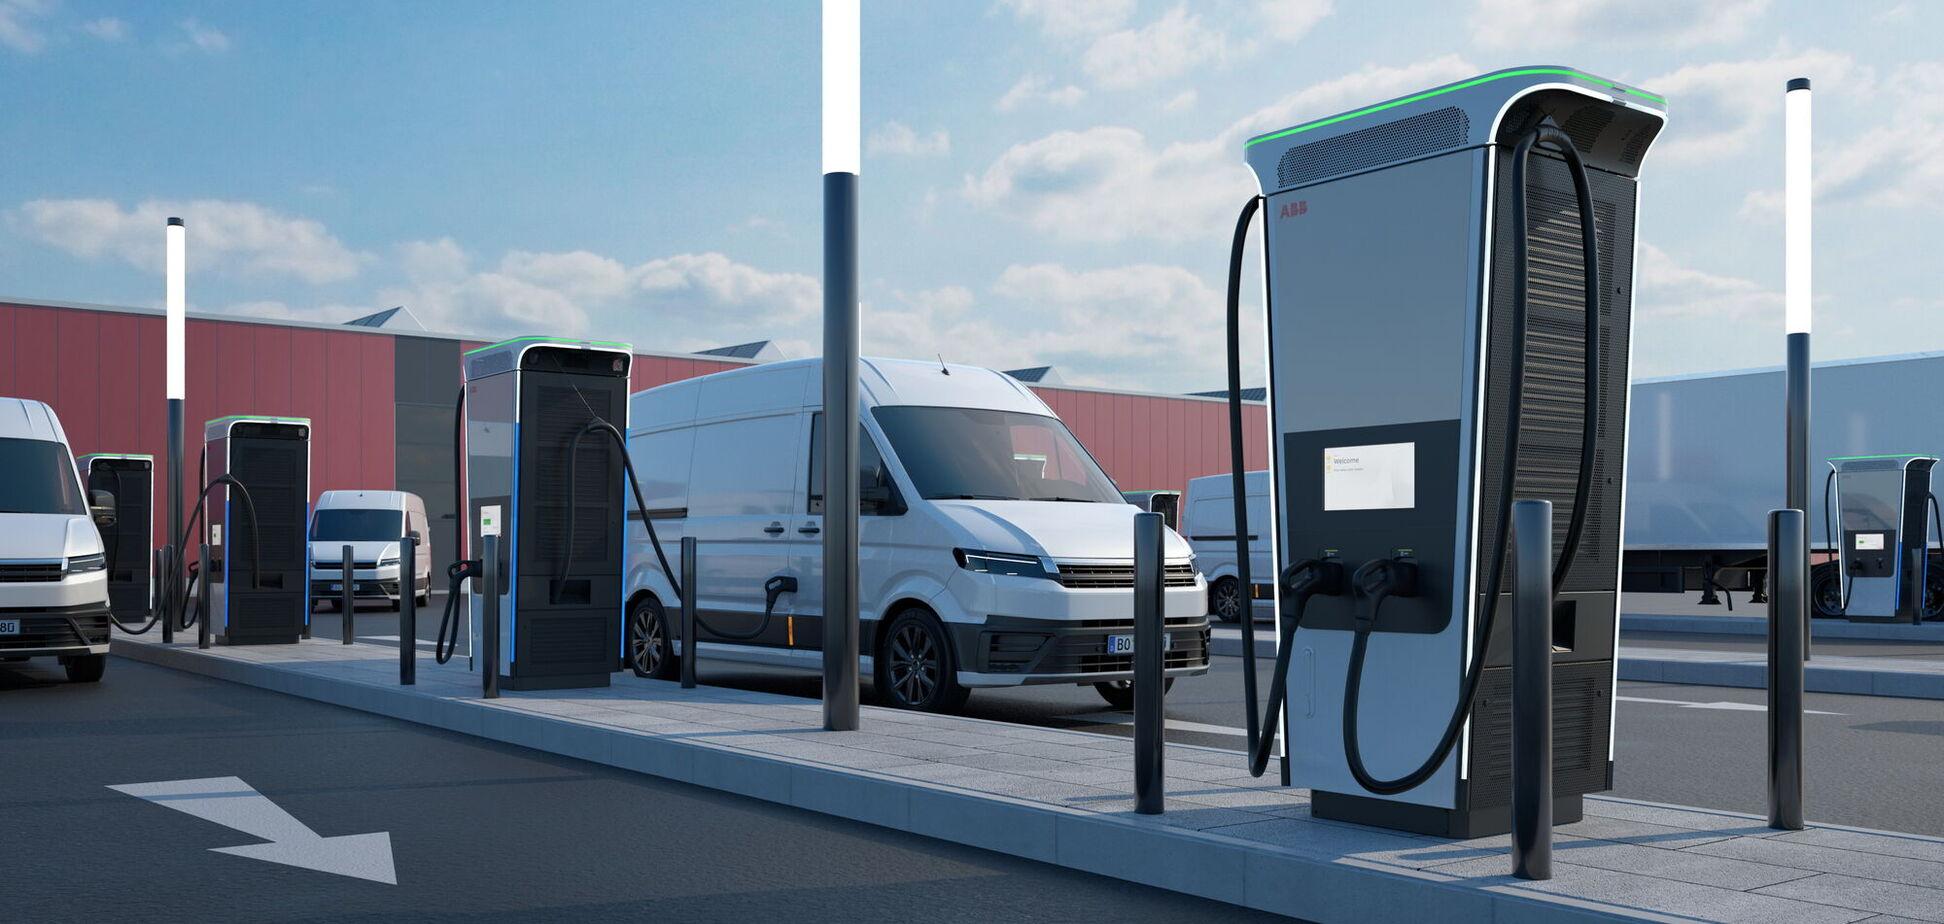 Концерн АВВ представил зарядную станцию на 360 кВт